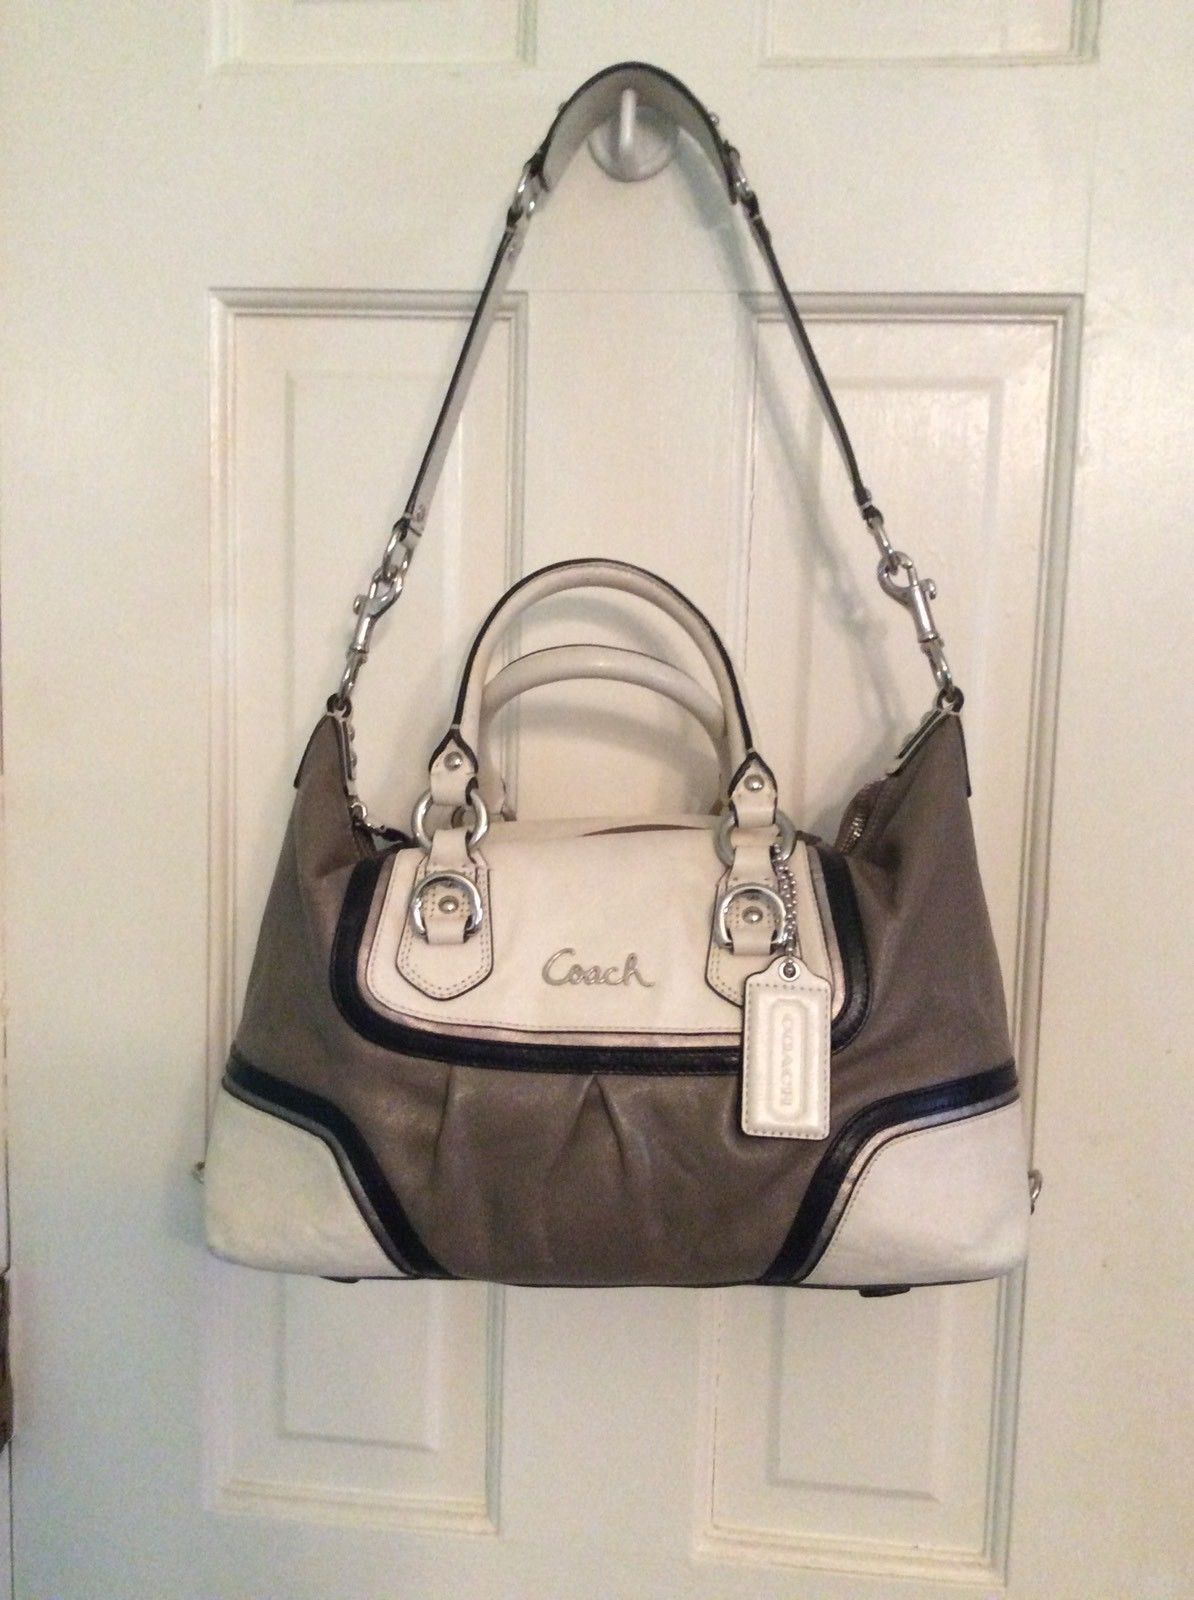 81c69b5991 women Coach Ashley Leather Cream brown Satchel Shoulder Bag Handbag Med